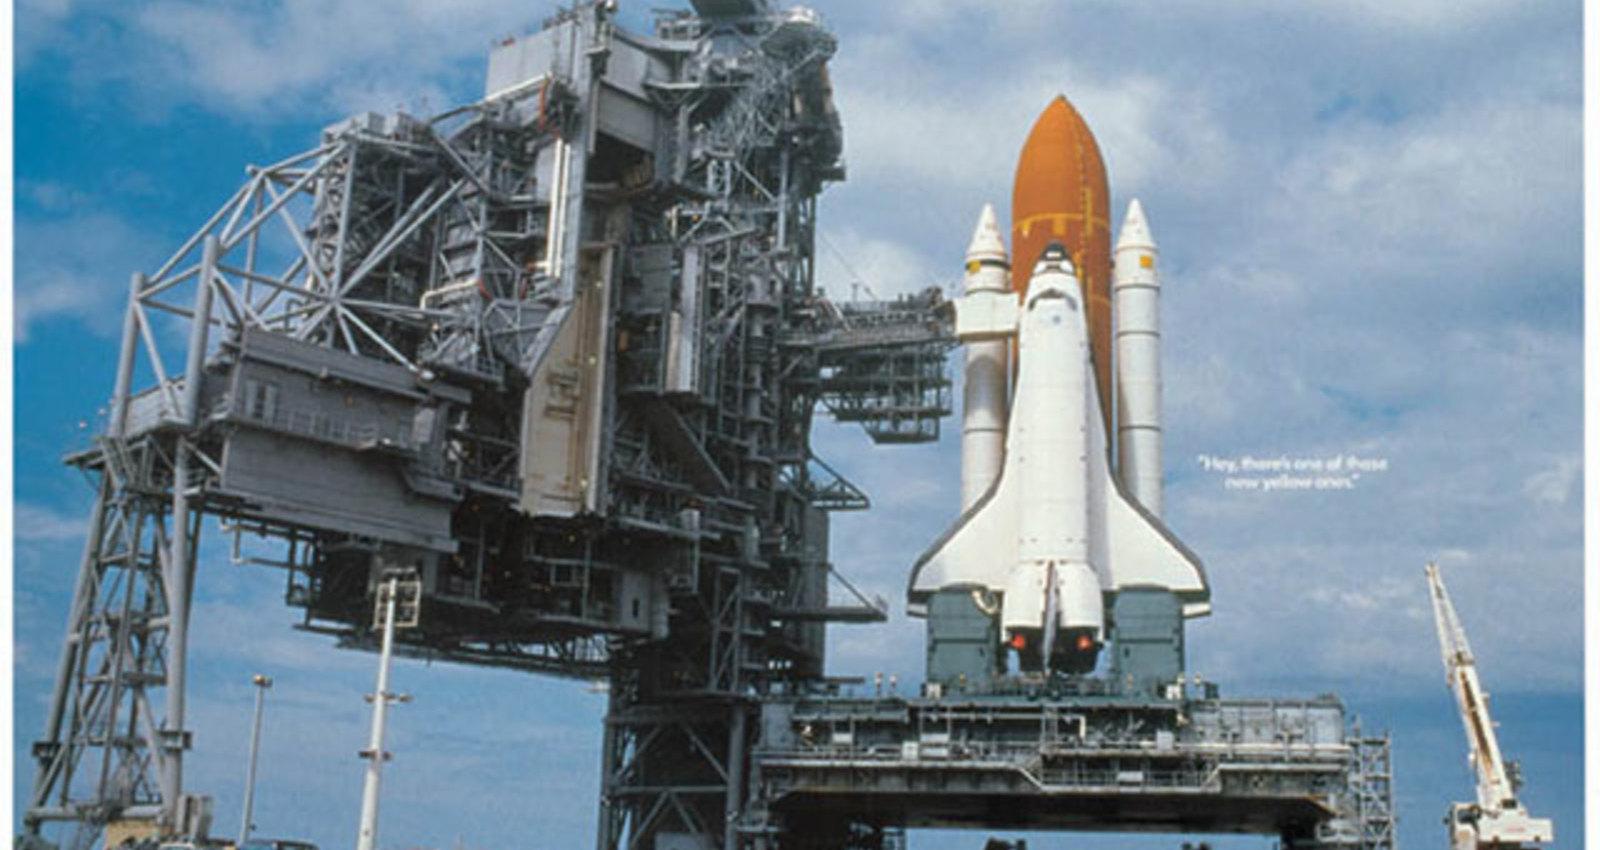 Hey There's a 1. Jumper 2. Lettucegirl 3. Bulls 4. Shuttle 5 Volcano